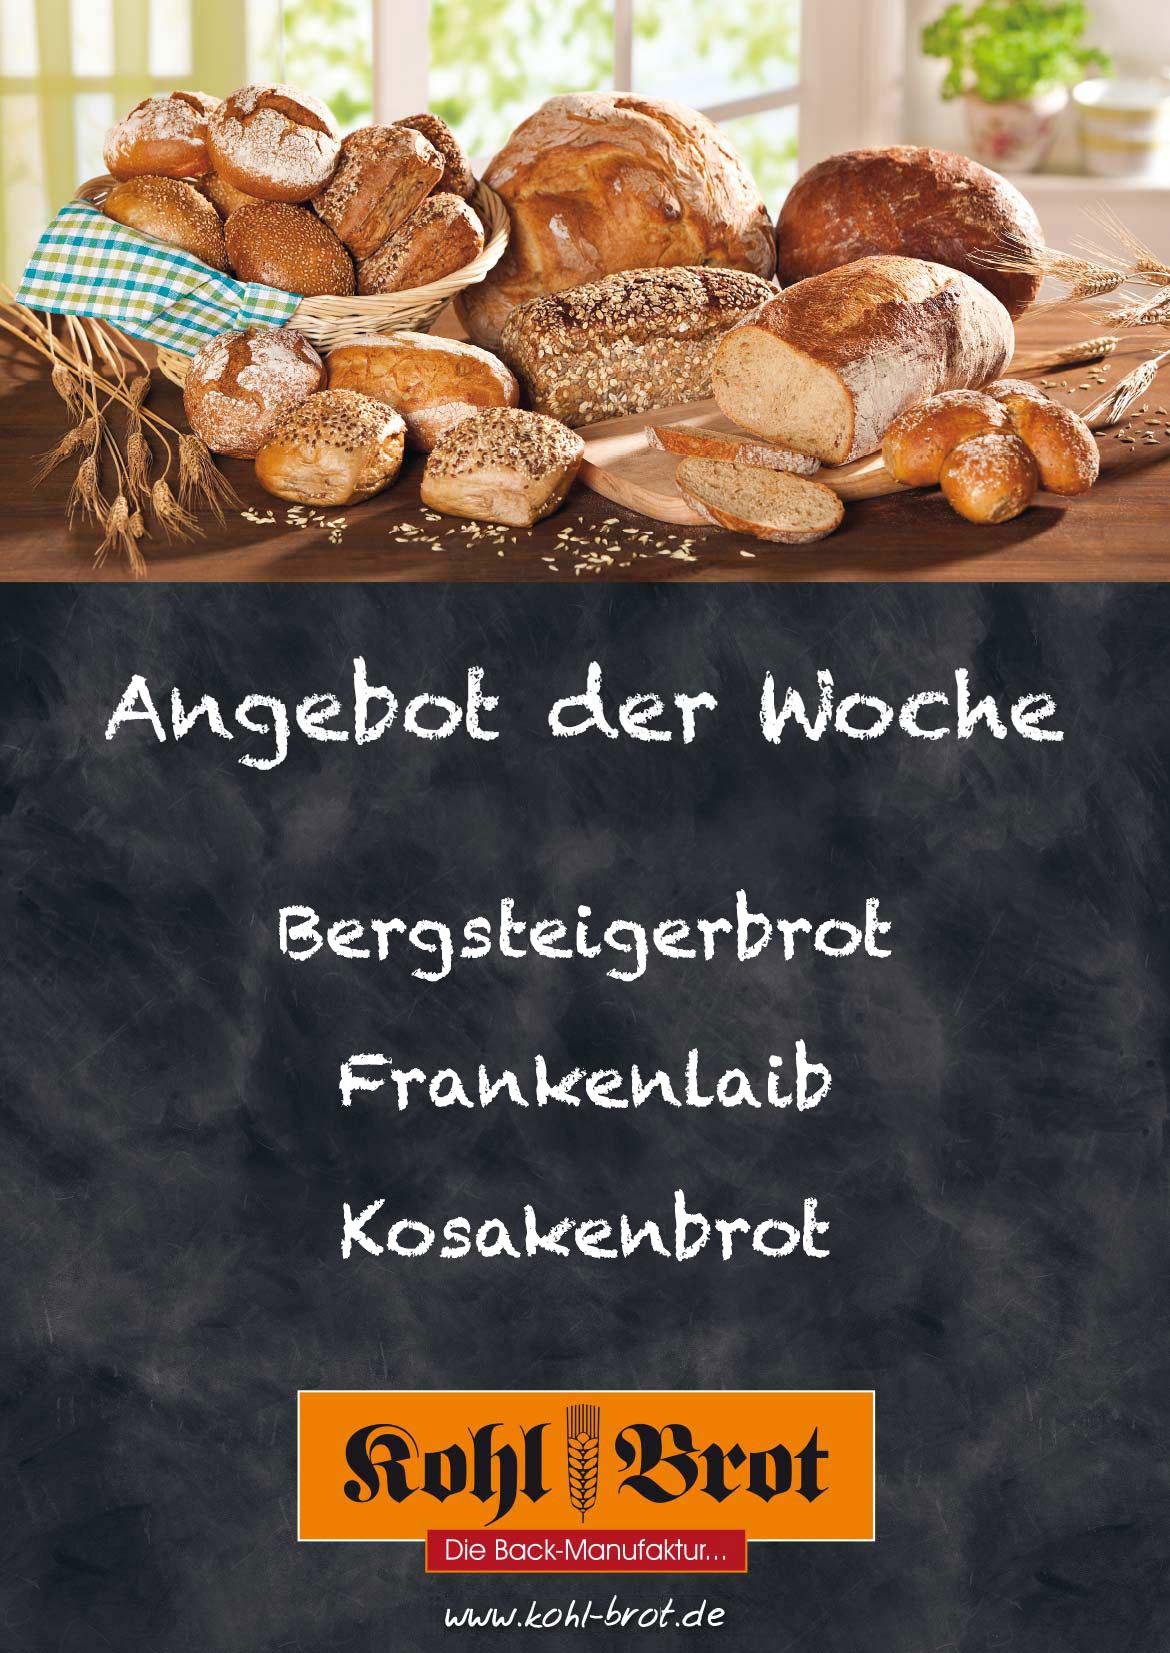 content_angebotsplakat_kohlbrot